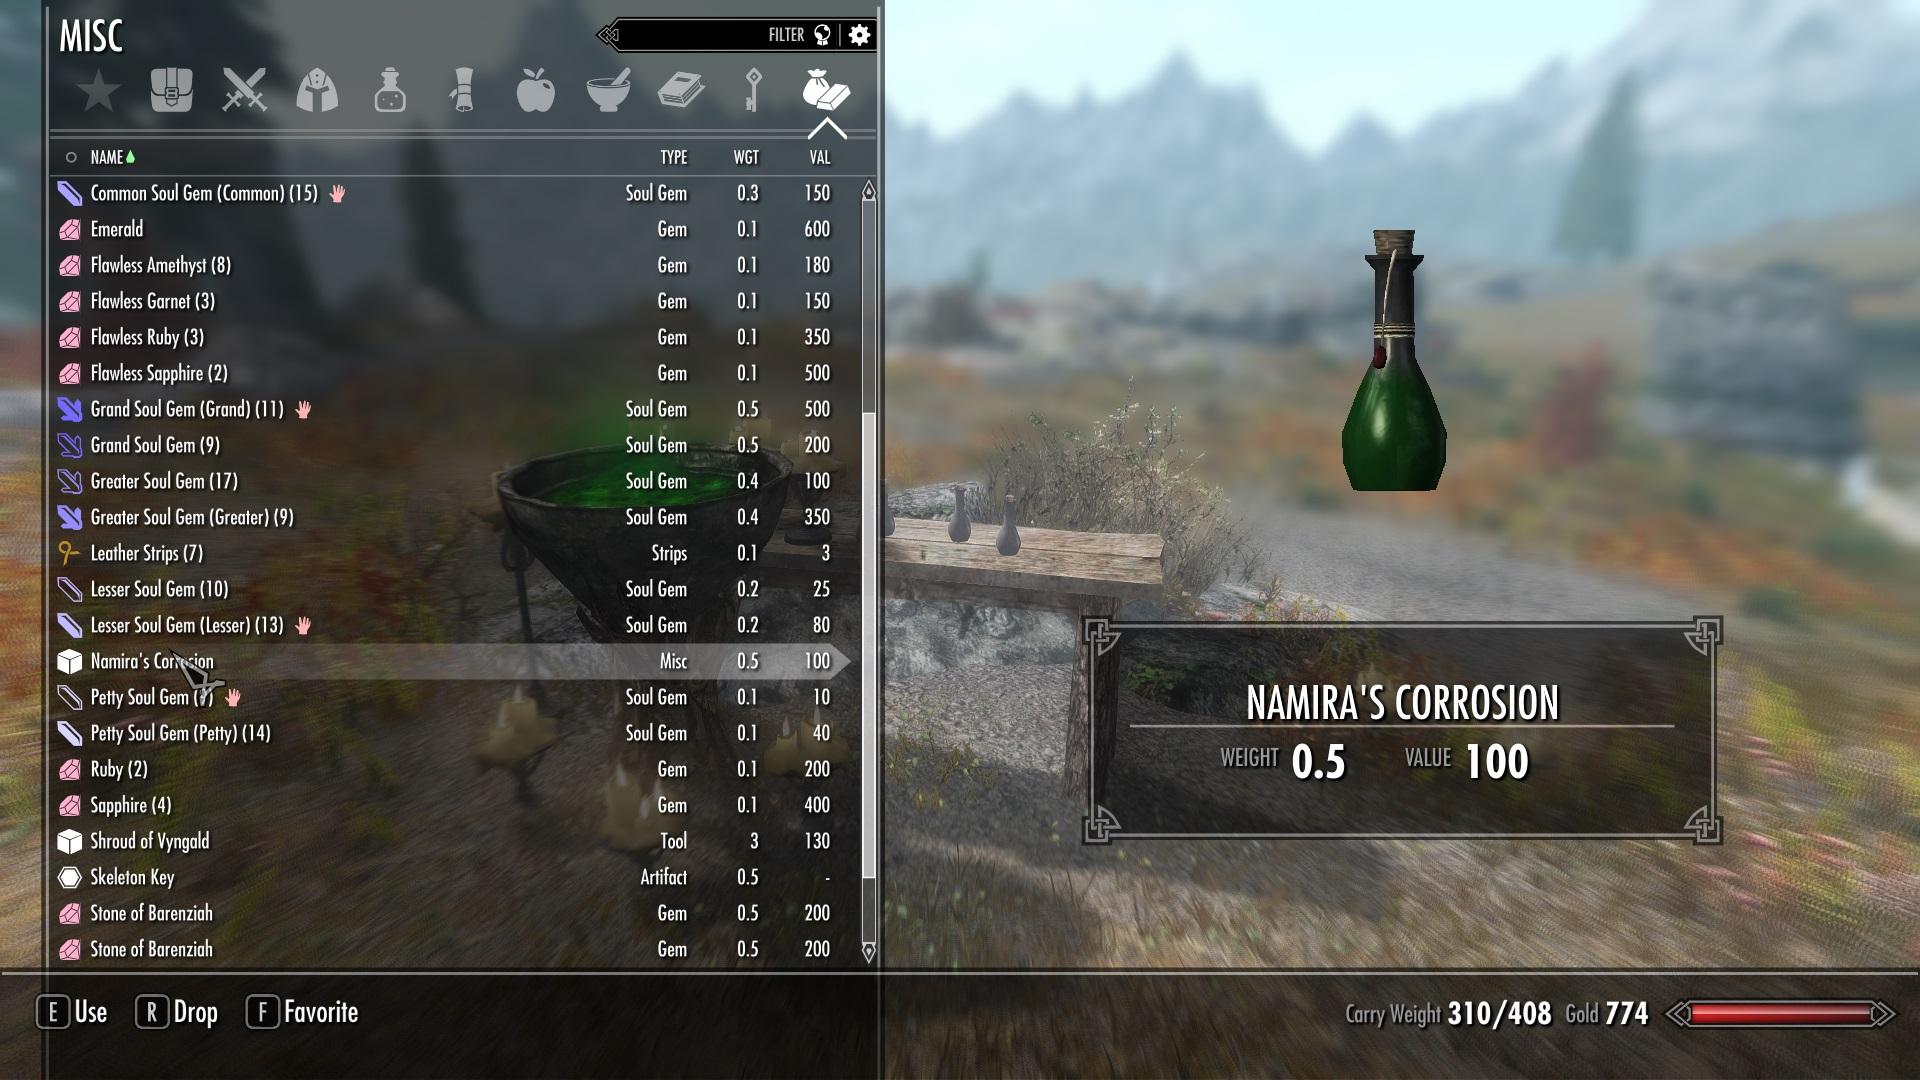 Namira's Corrosion | The Elder Scrolls Mods Wiki | FANDOM